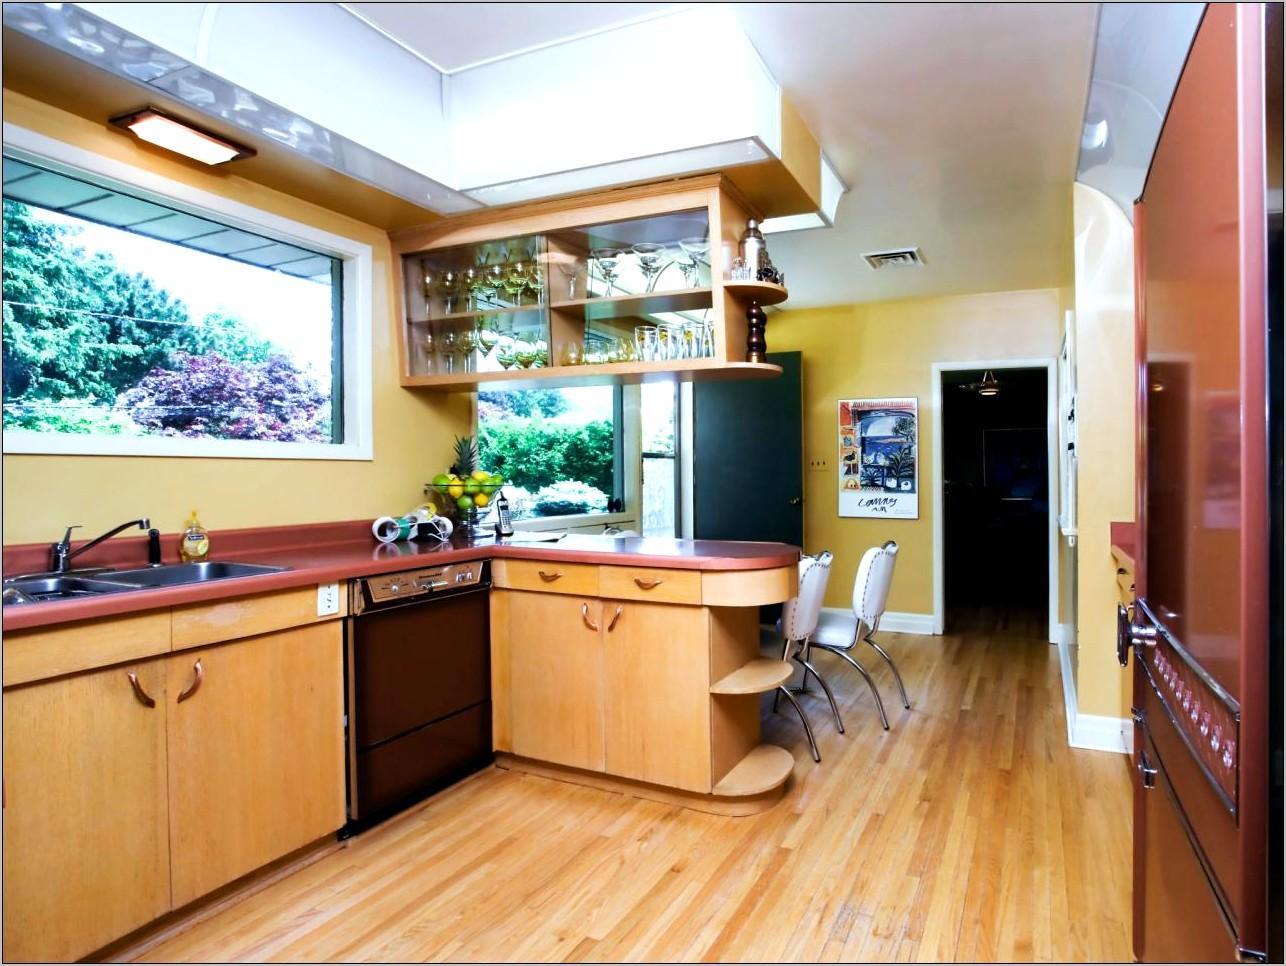 Kitchen Decorating With Mid Century Modern Furniture